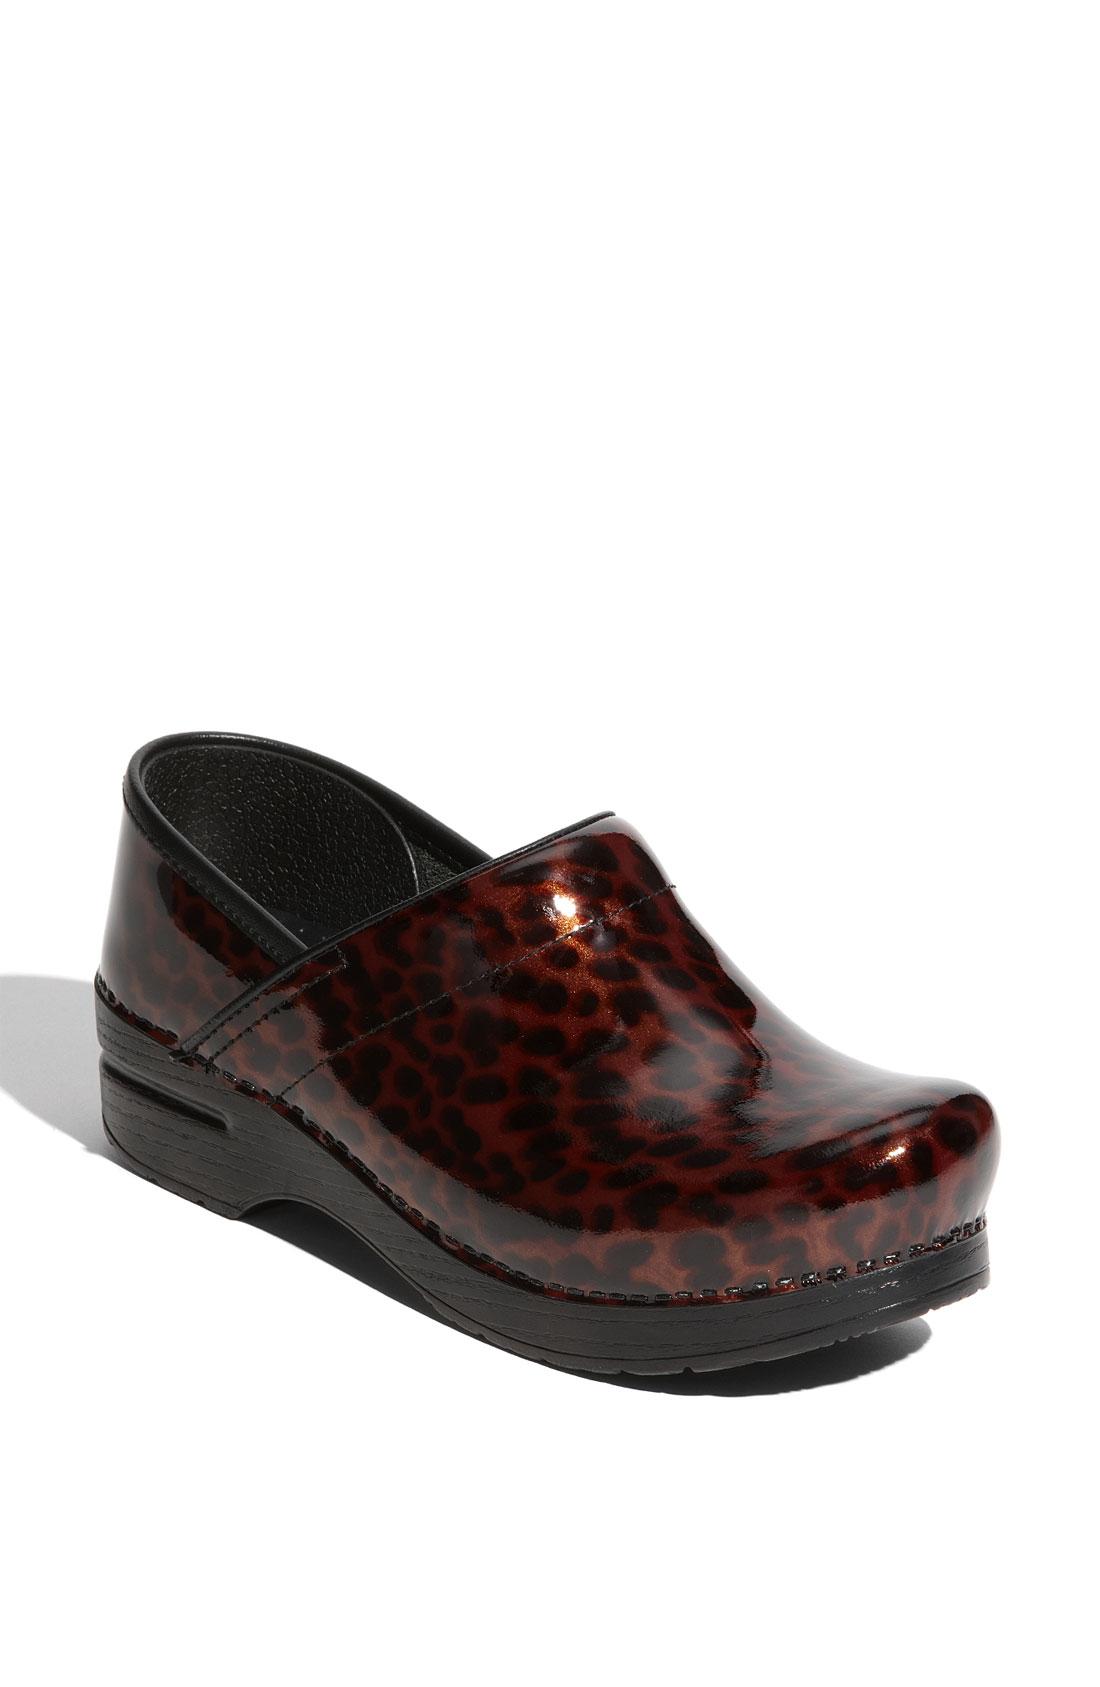 Dansko Shoes Nordstrom